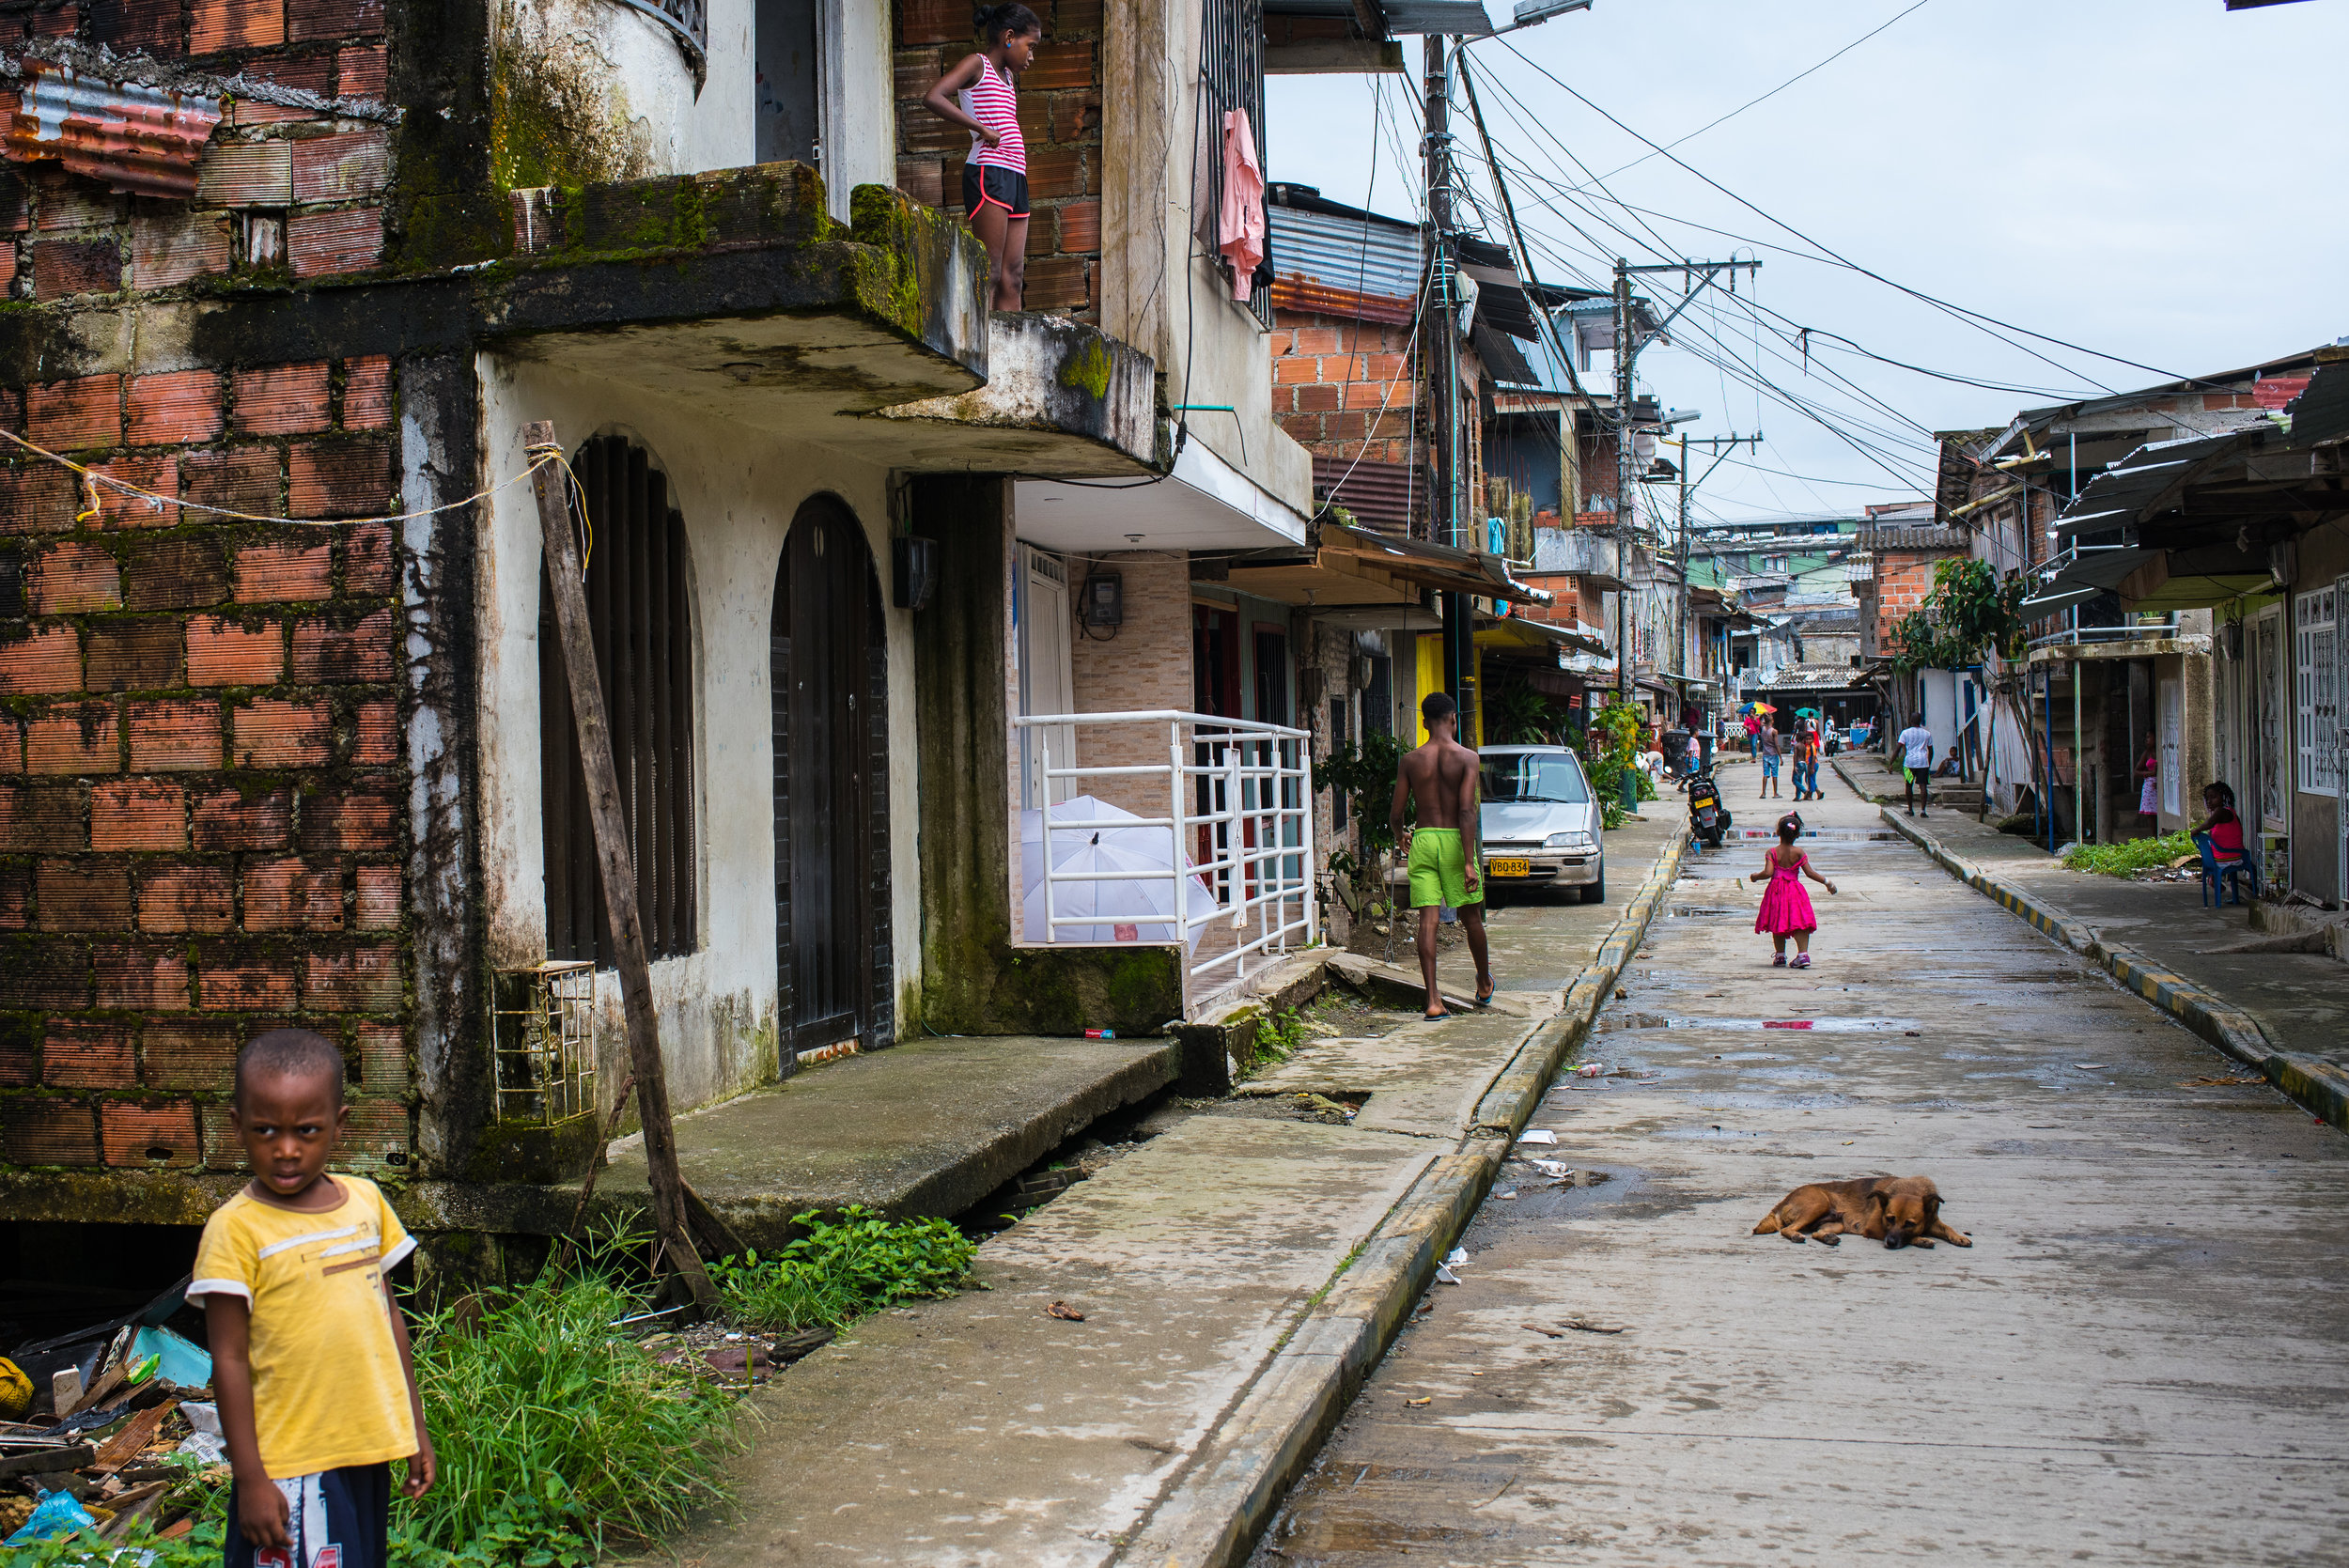 Ebony, in pink, walks on prosthetic legs down the street where she lives.